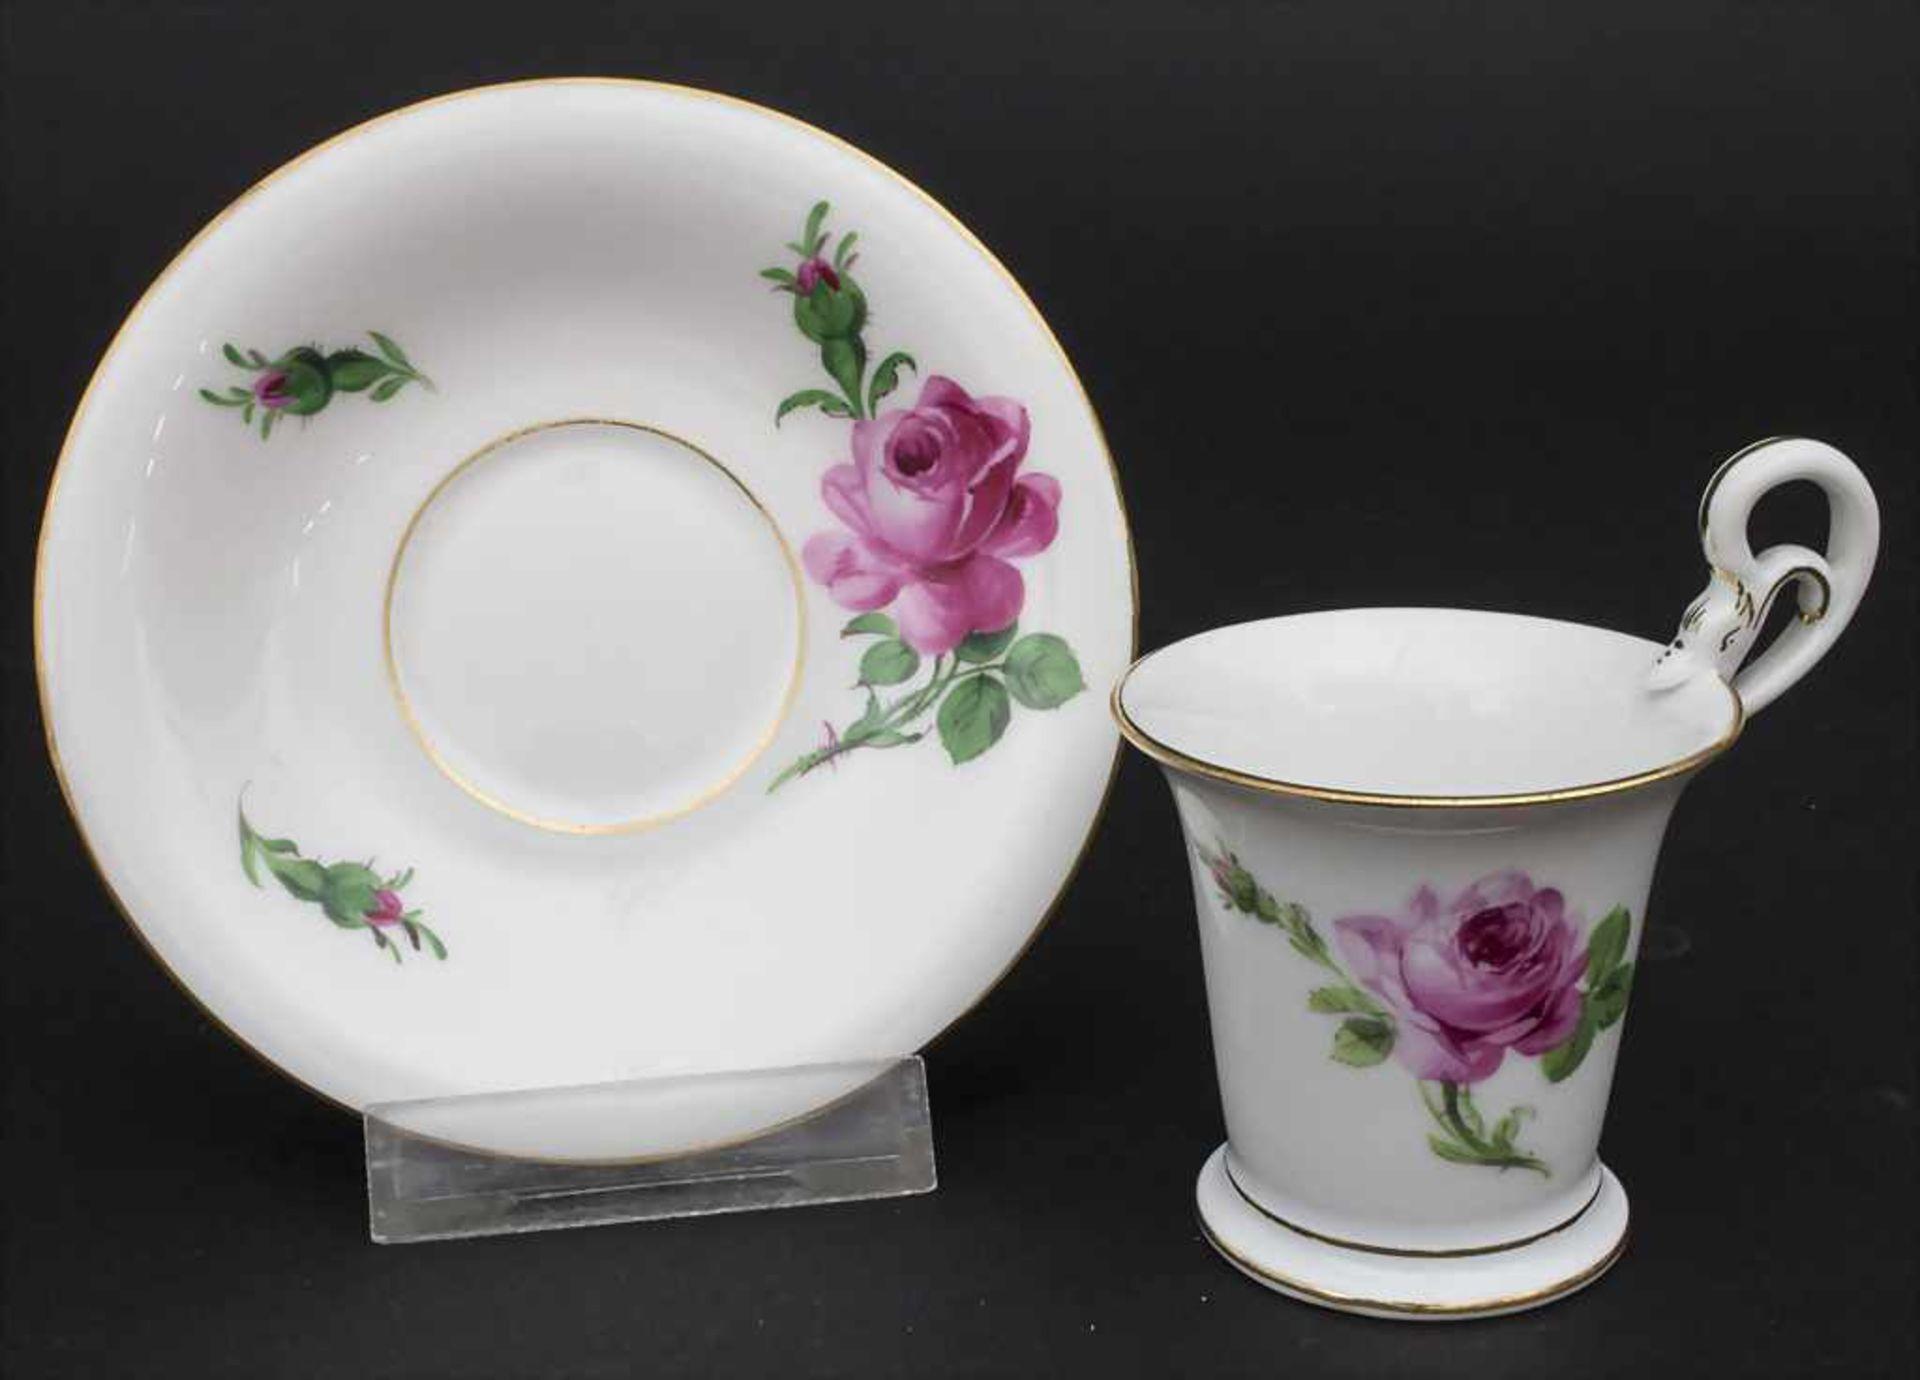 Konvolut Porzellane mit Rosendekor / A set of porcelain with roses, Meissen, 20. Jh. - Bild 6 aus 13